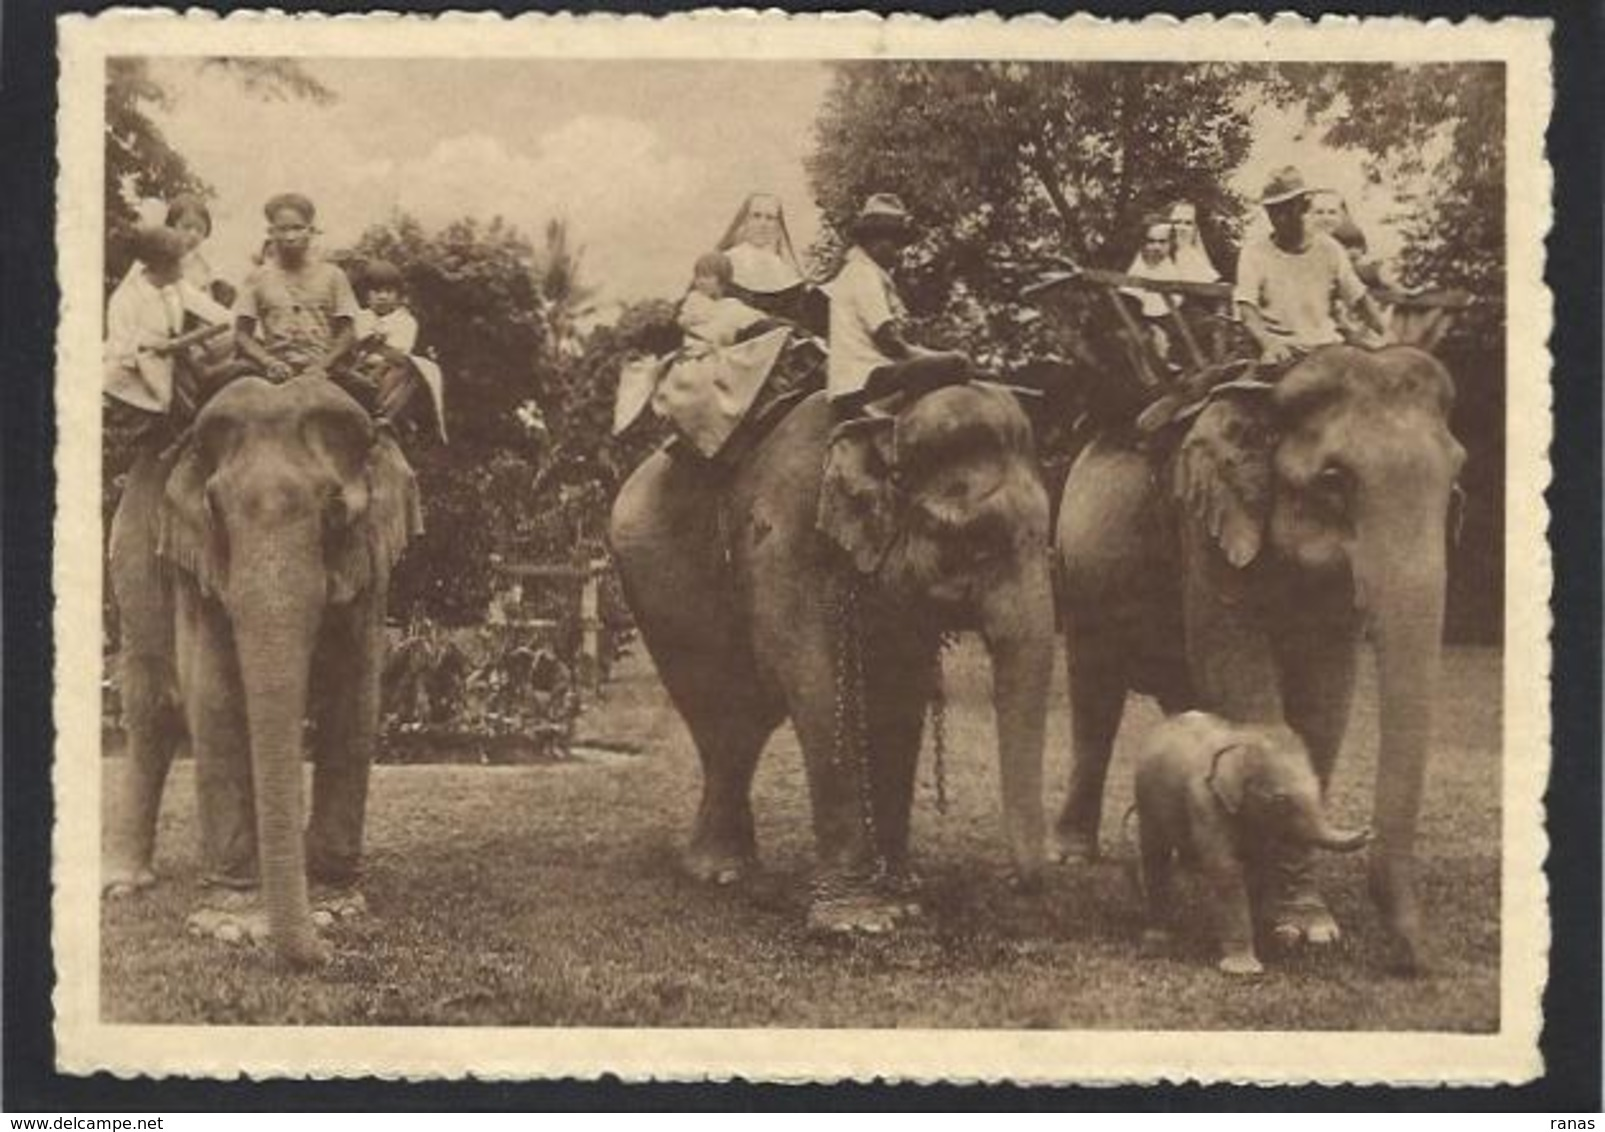 CPSM SIAM Thaïlande Asie Non Circulé éléphant - Thailand